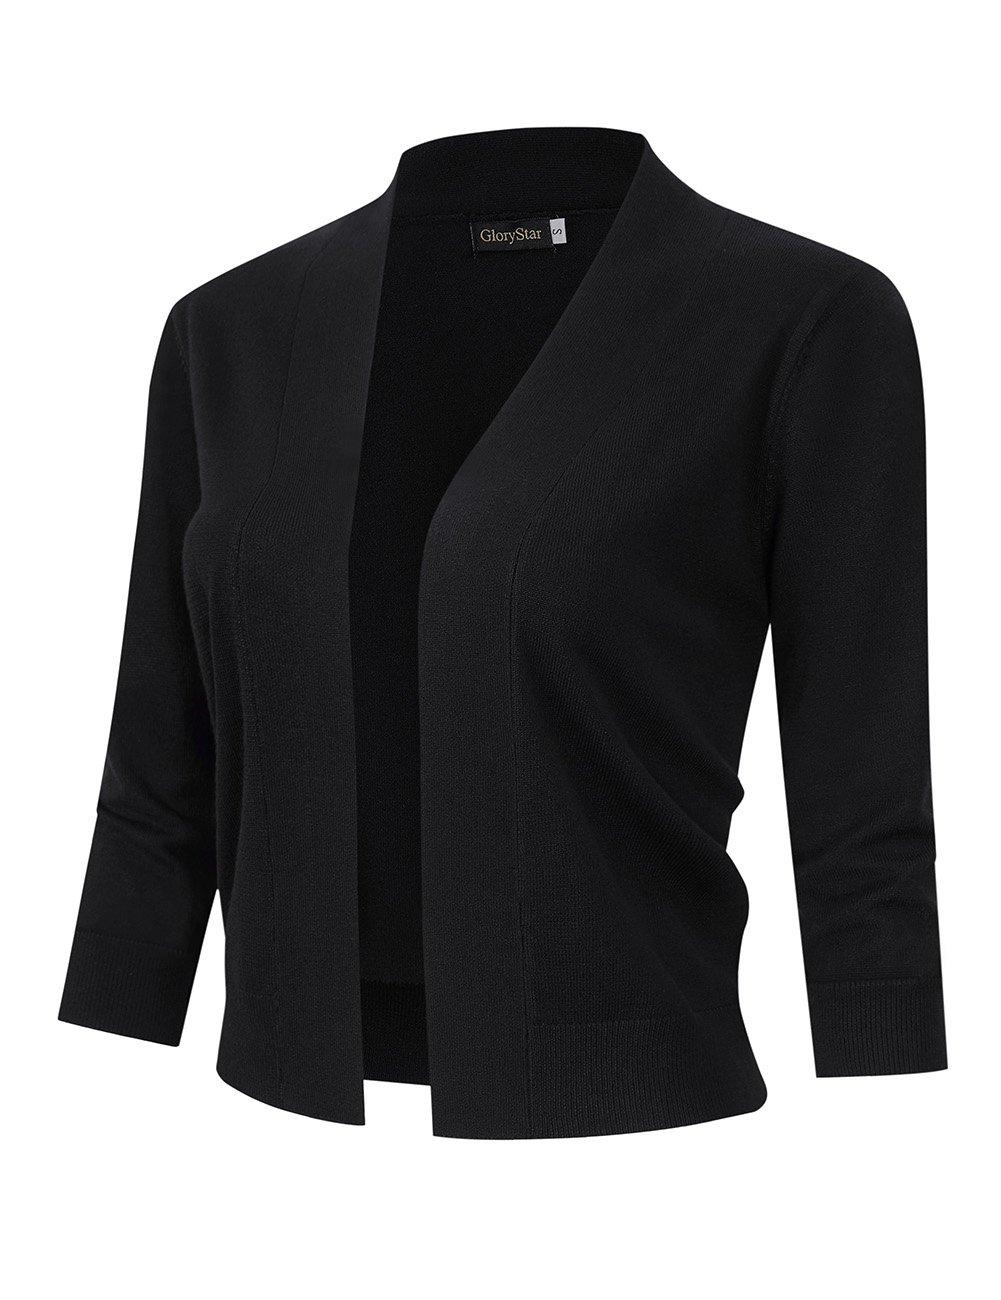 GloryStar Women's 3/4 Sleeve Open Front Lightweight Knit Cropped Cardigan Sweater Black XL